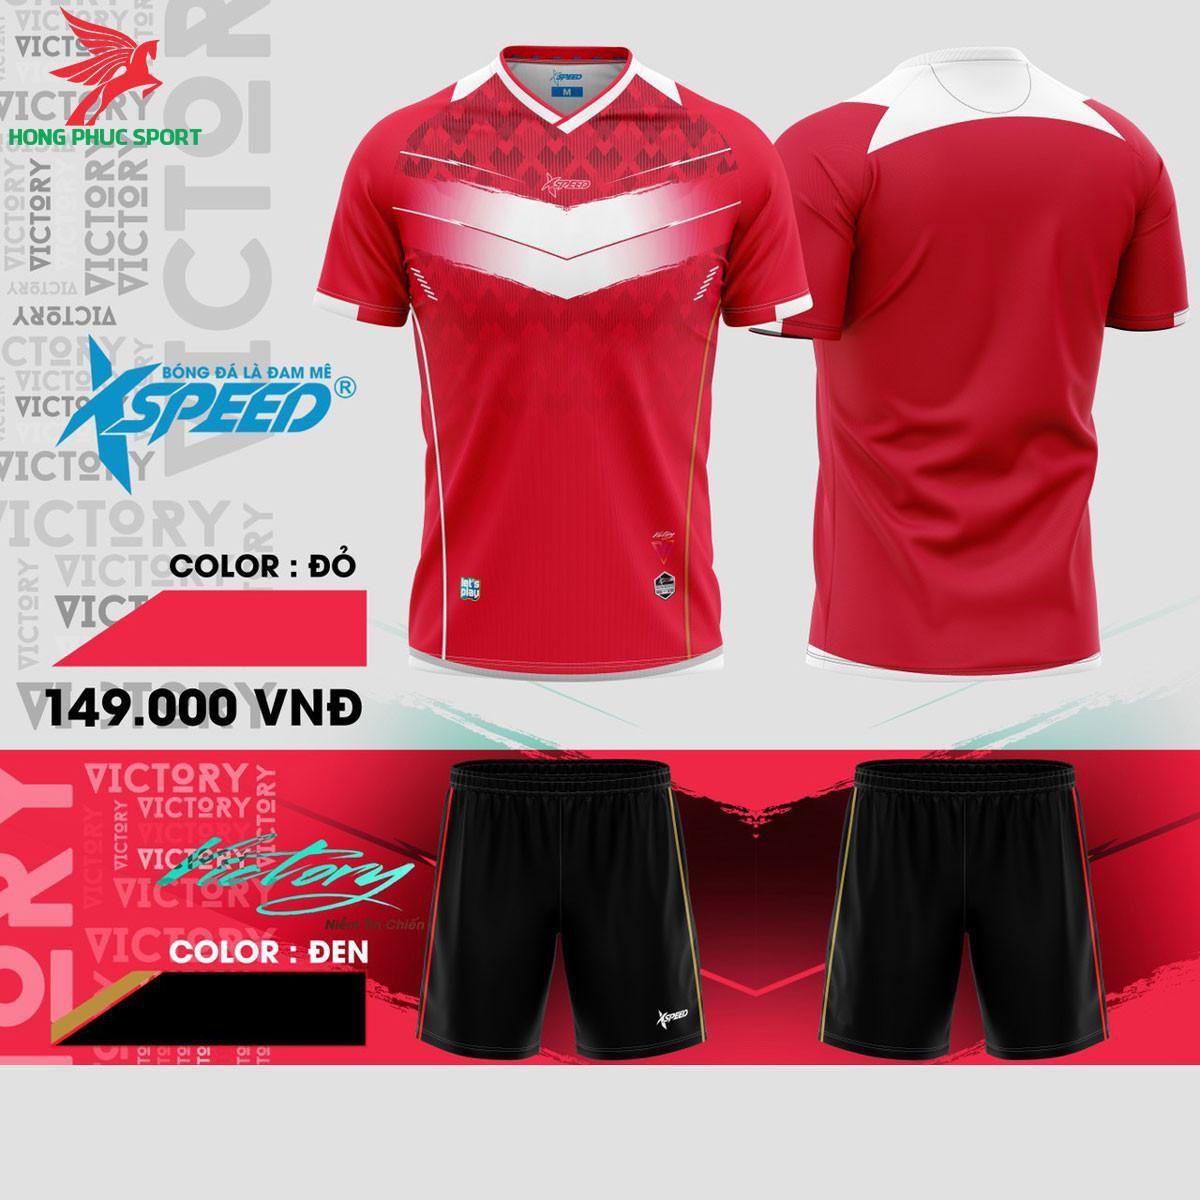 https://cdn.hongphucsport.com/unsafe/s4.shopbay.vn/files/285/ao-khong-logo-xspeed-victory-mau-do-6051699048728.jpg